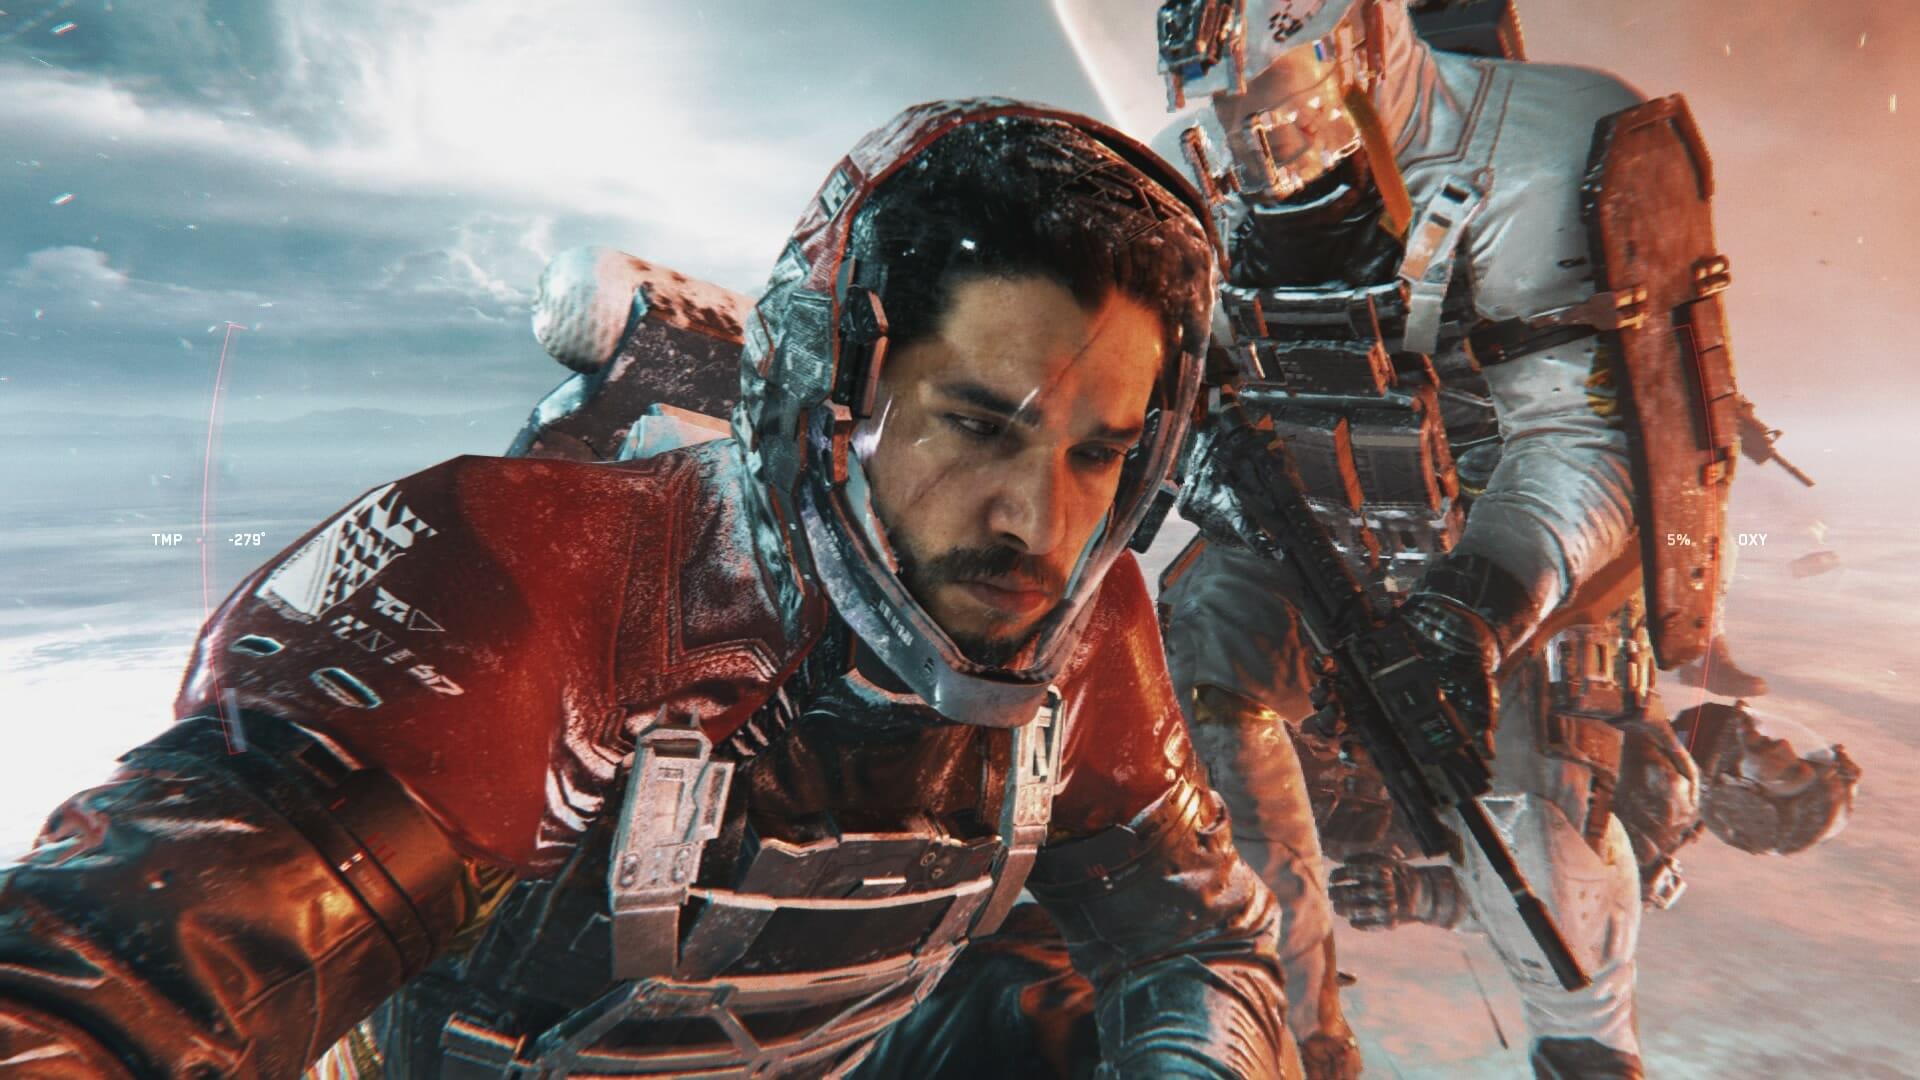 Call of Duty: Infinite Warfare - Jon Snow